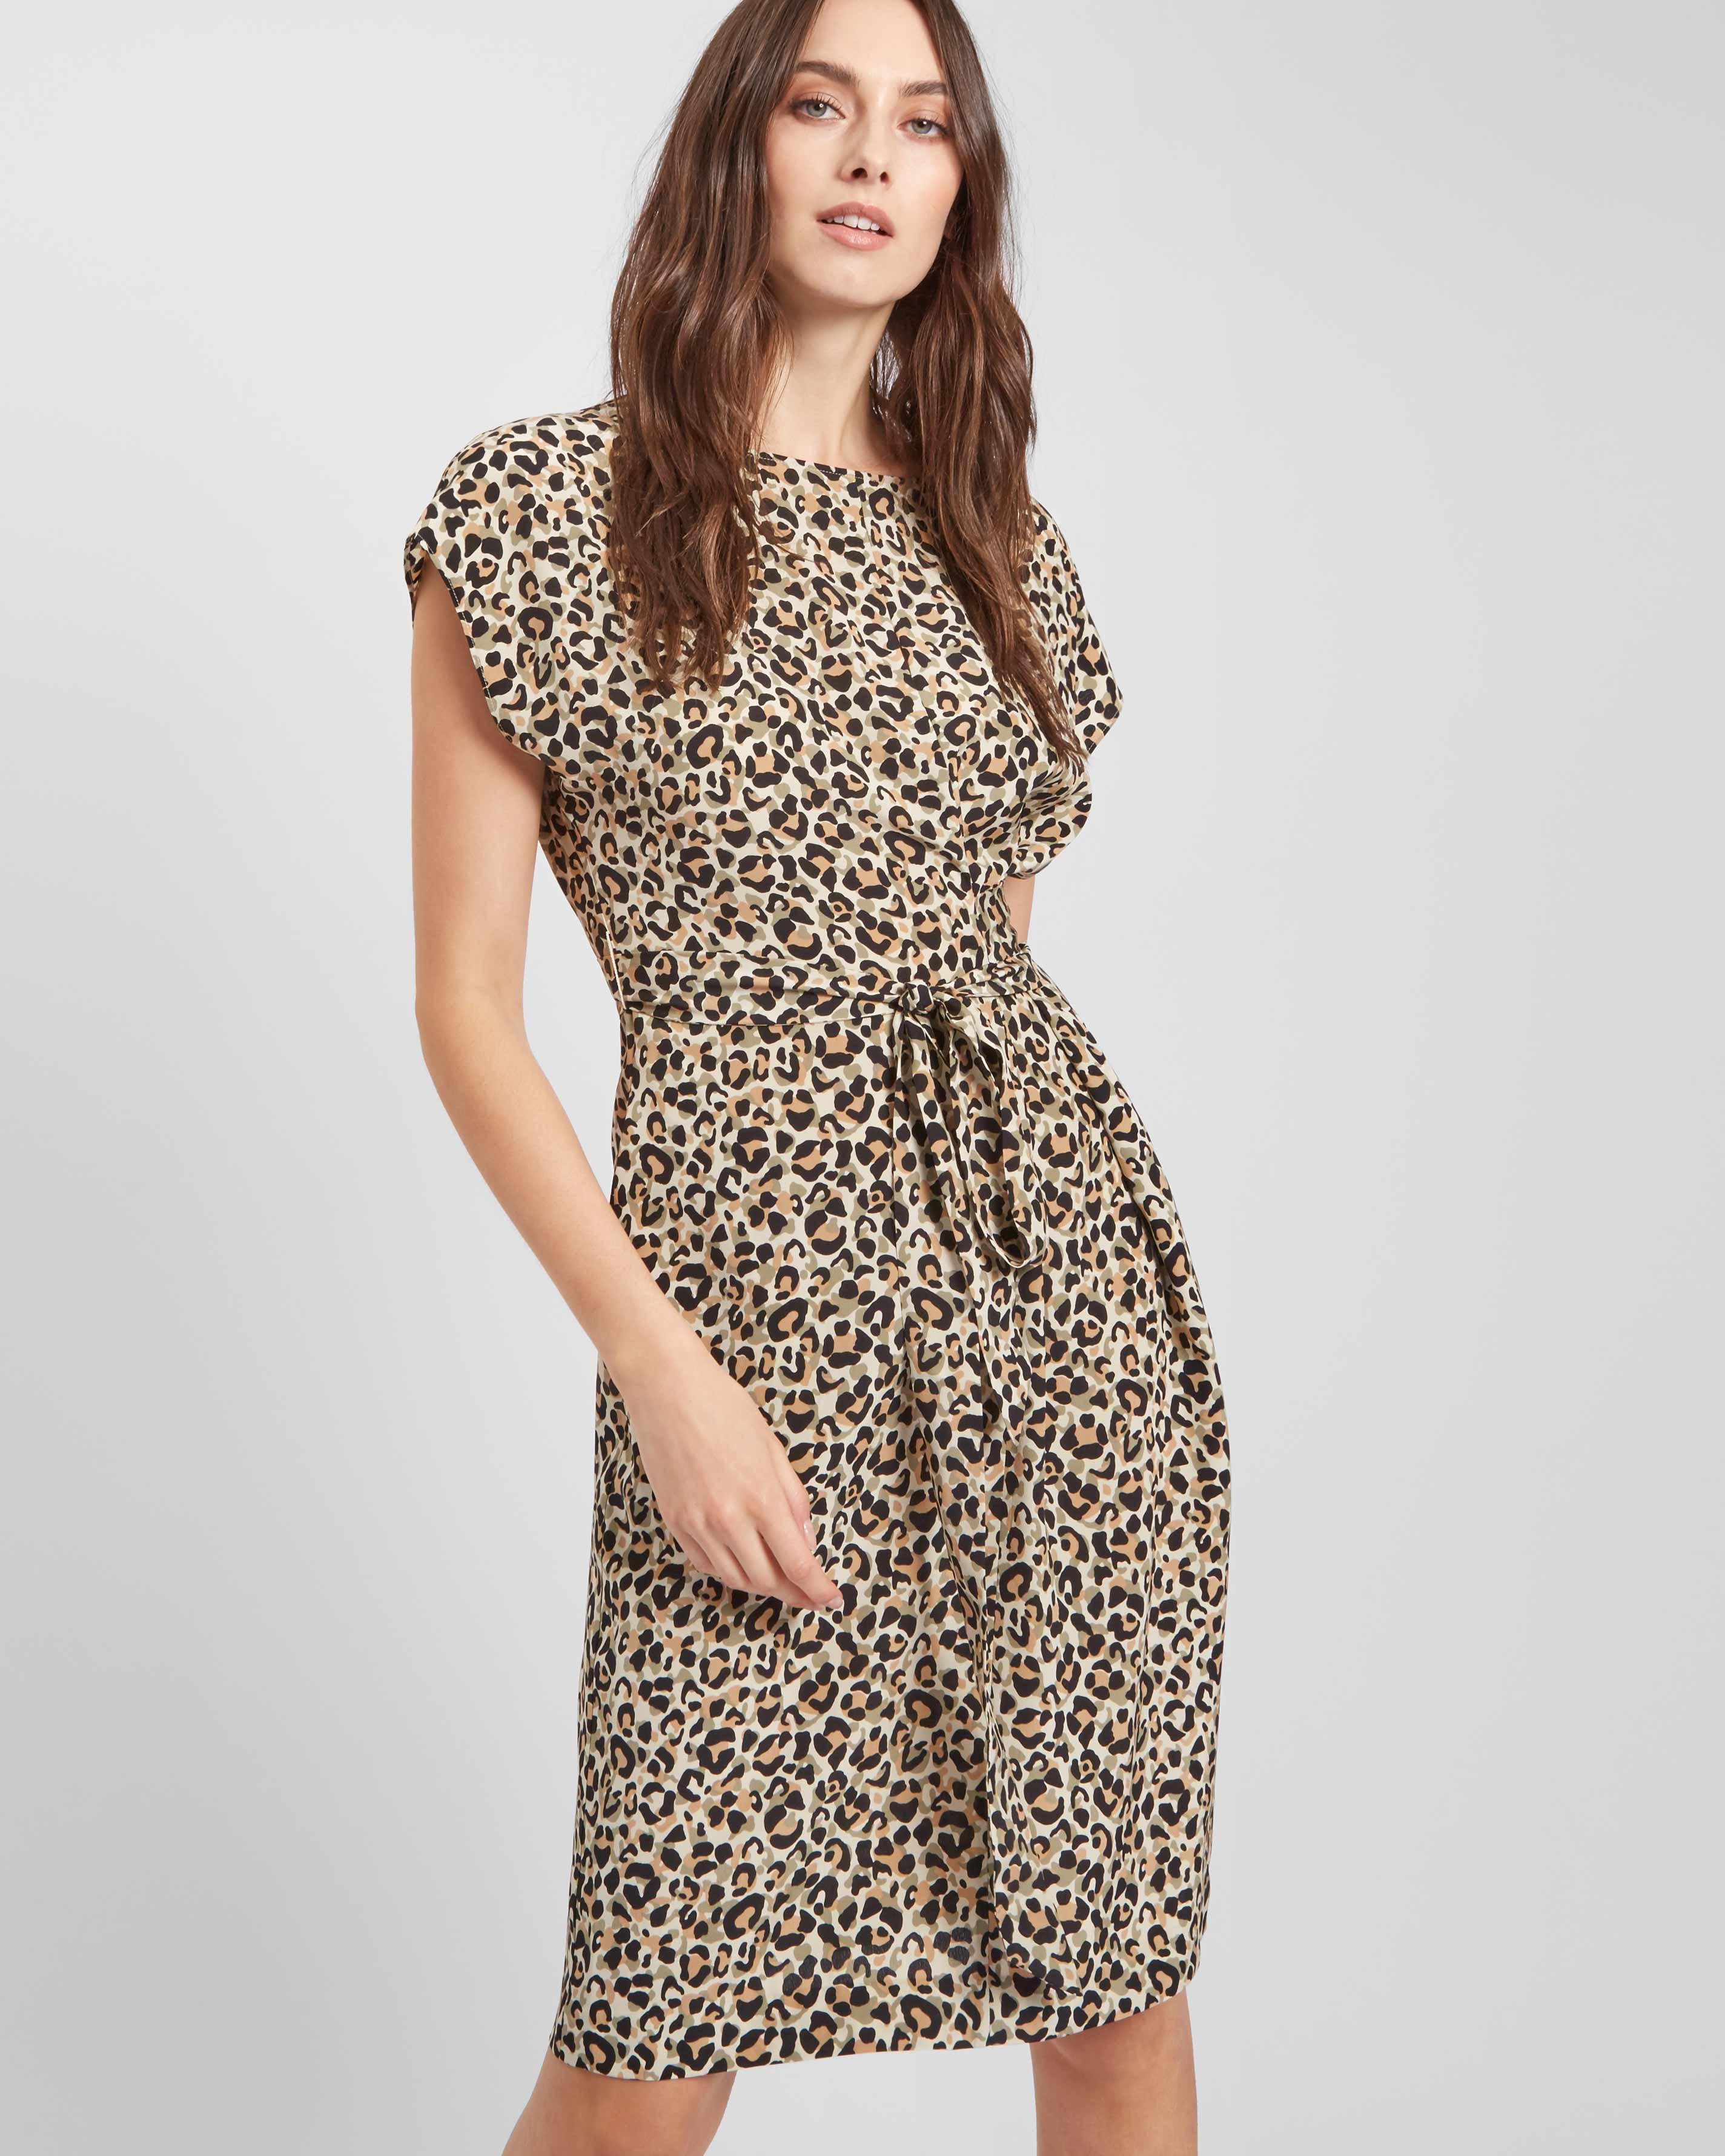 Lyst - Jaeger Silk Leopard Print Wrap Dress in White b03745a2a